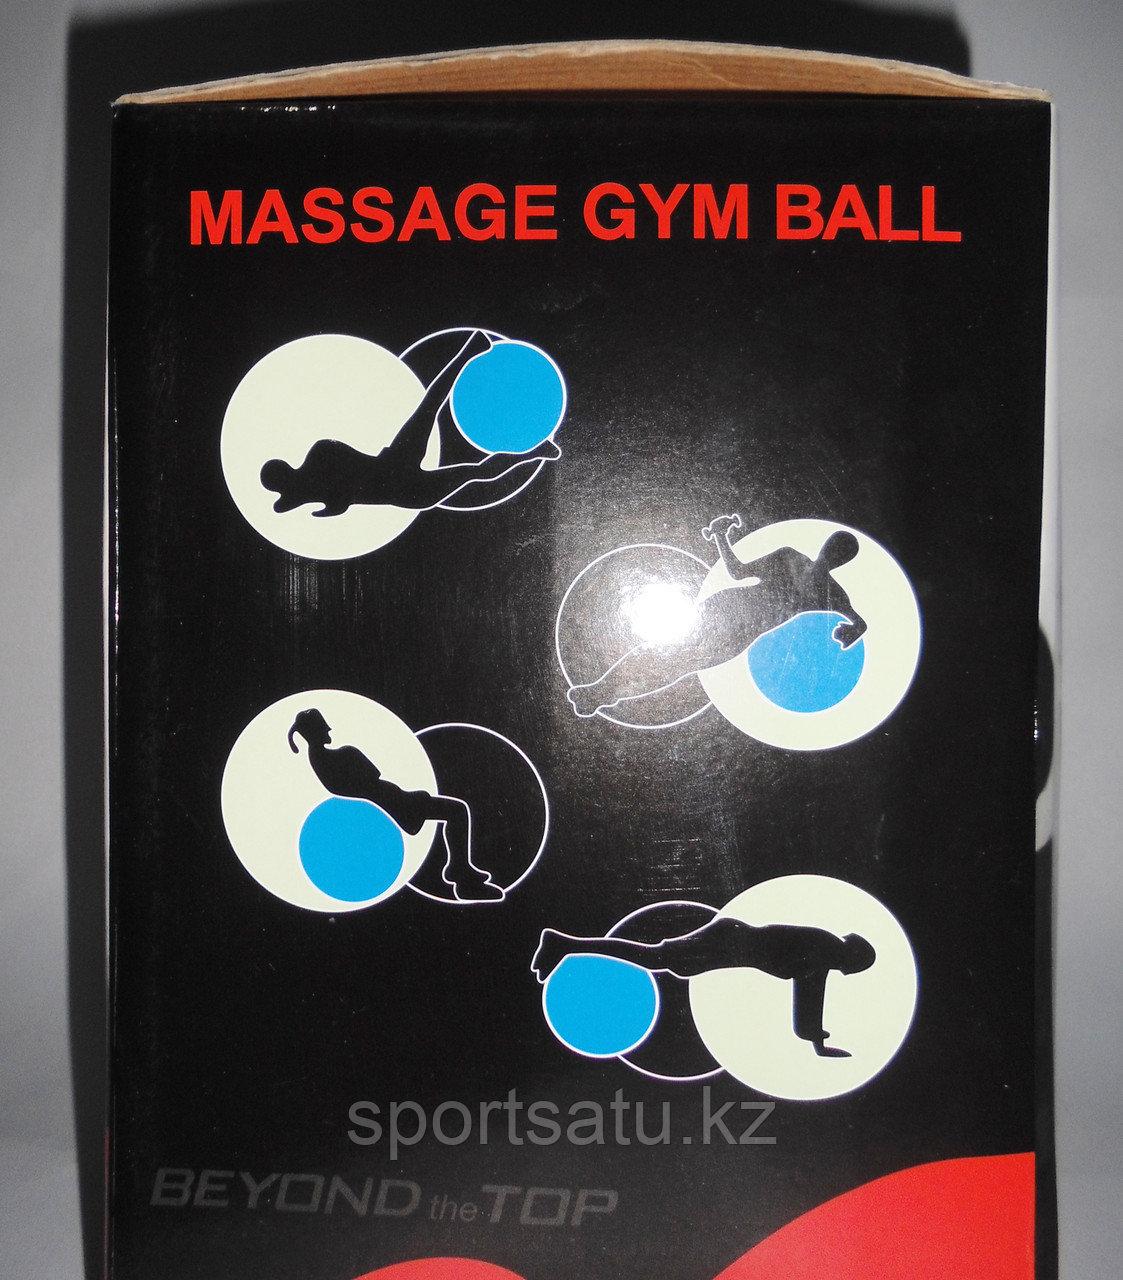 Гимнастический мяч 85 MASSAGE GYM BALL - фото 4